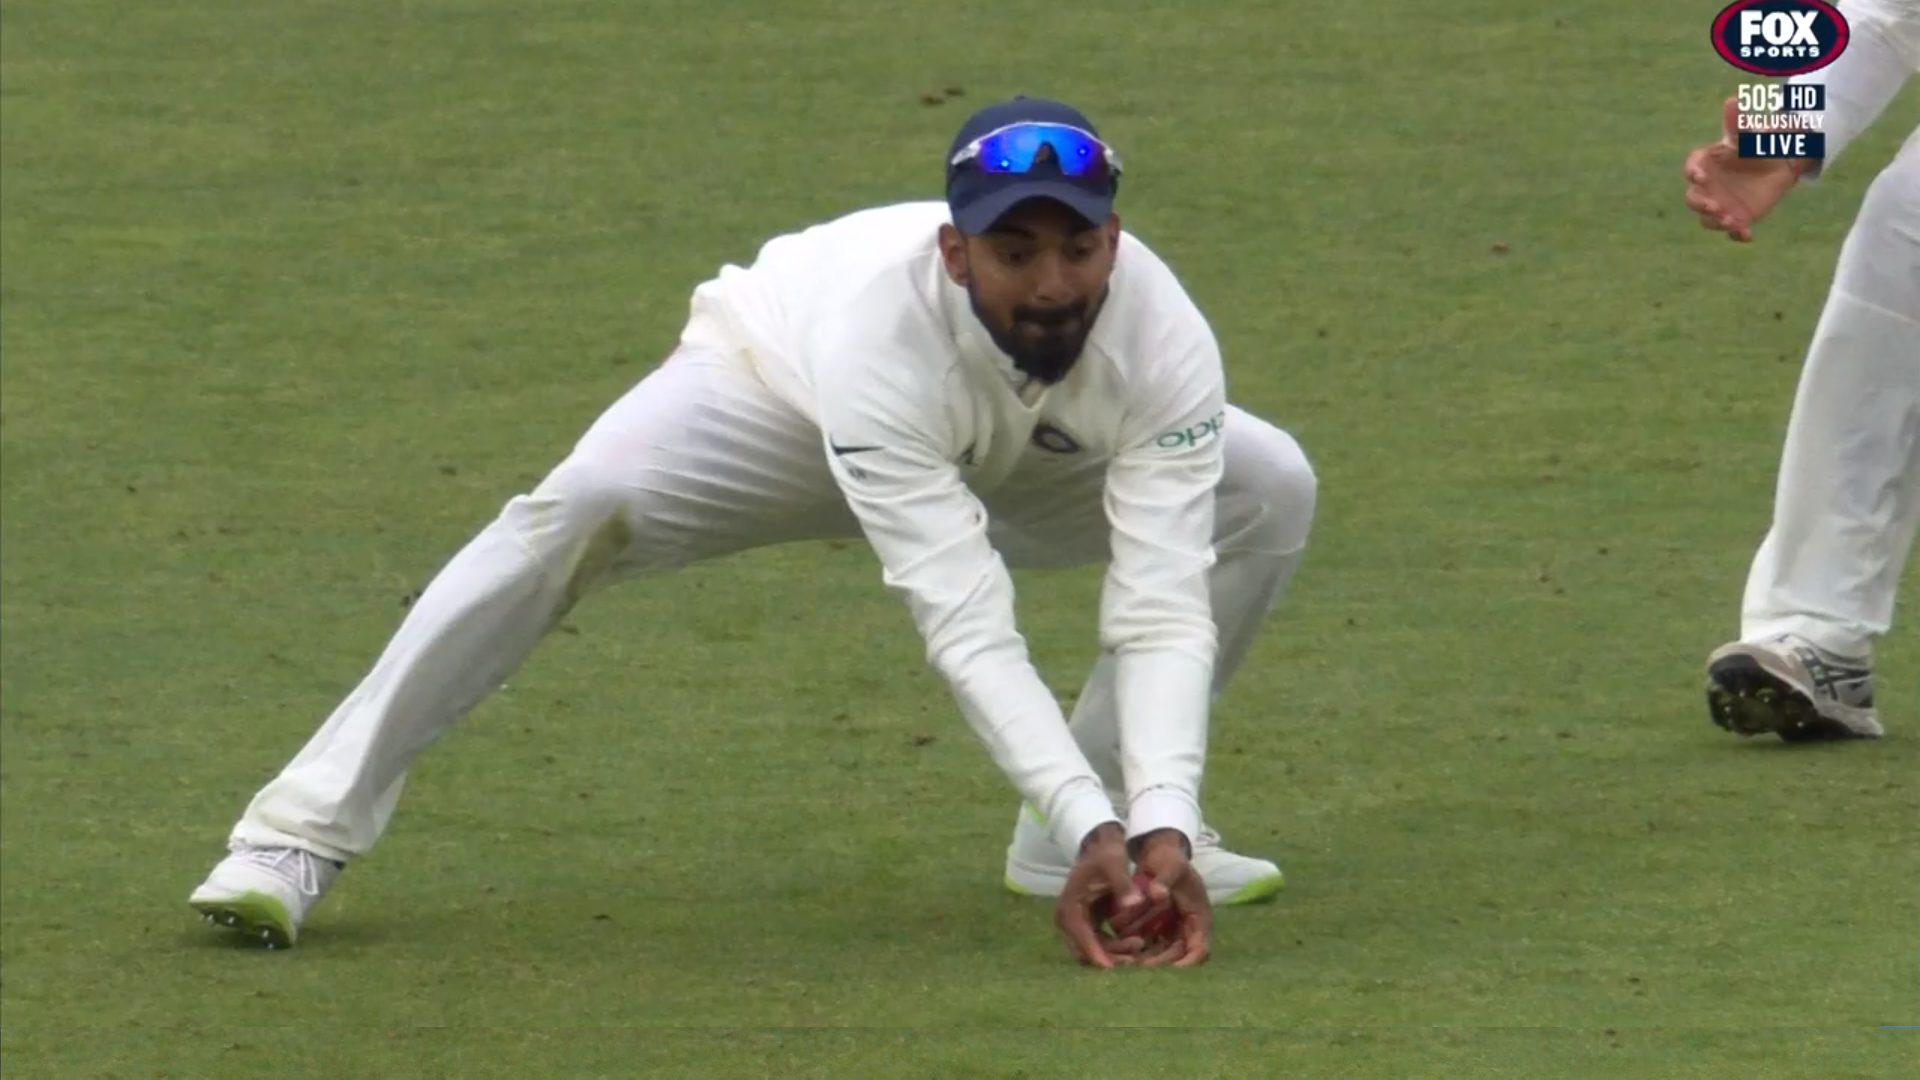 KL Rahul's low catch off Joe Root // Fox Cricket